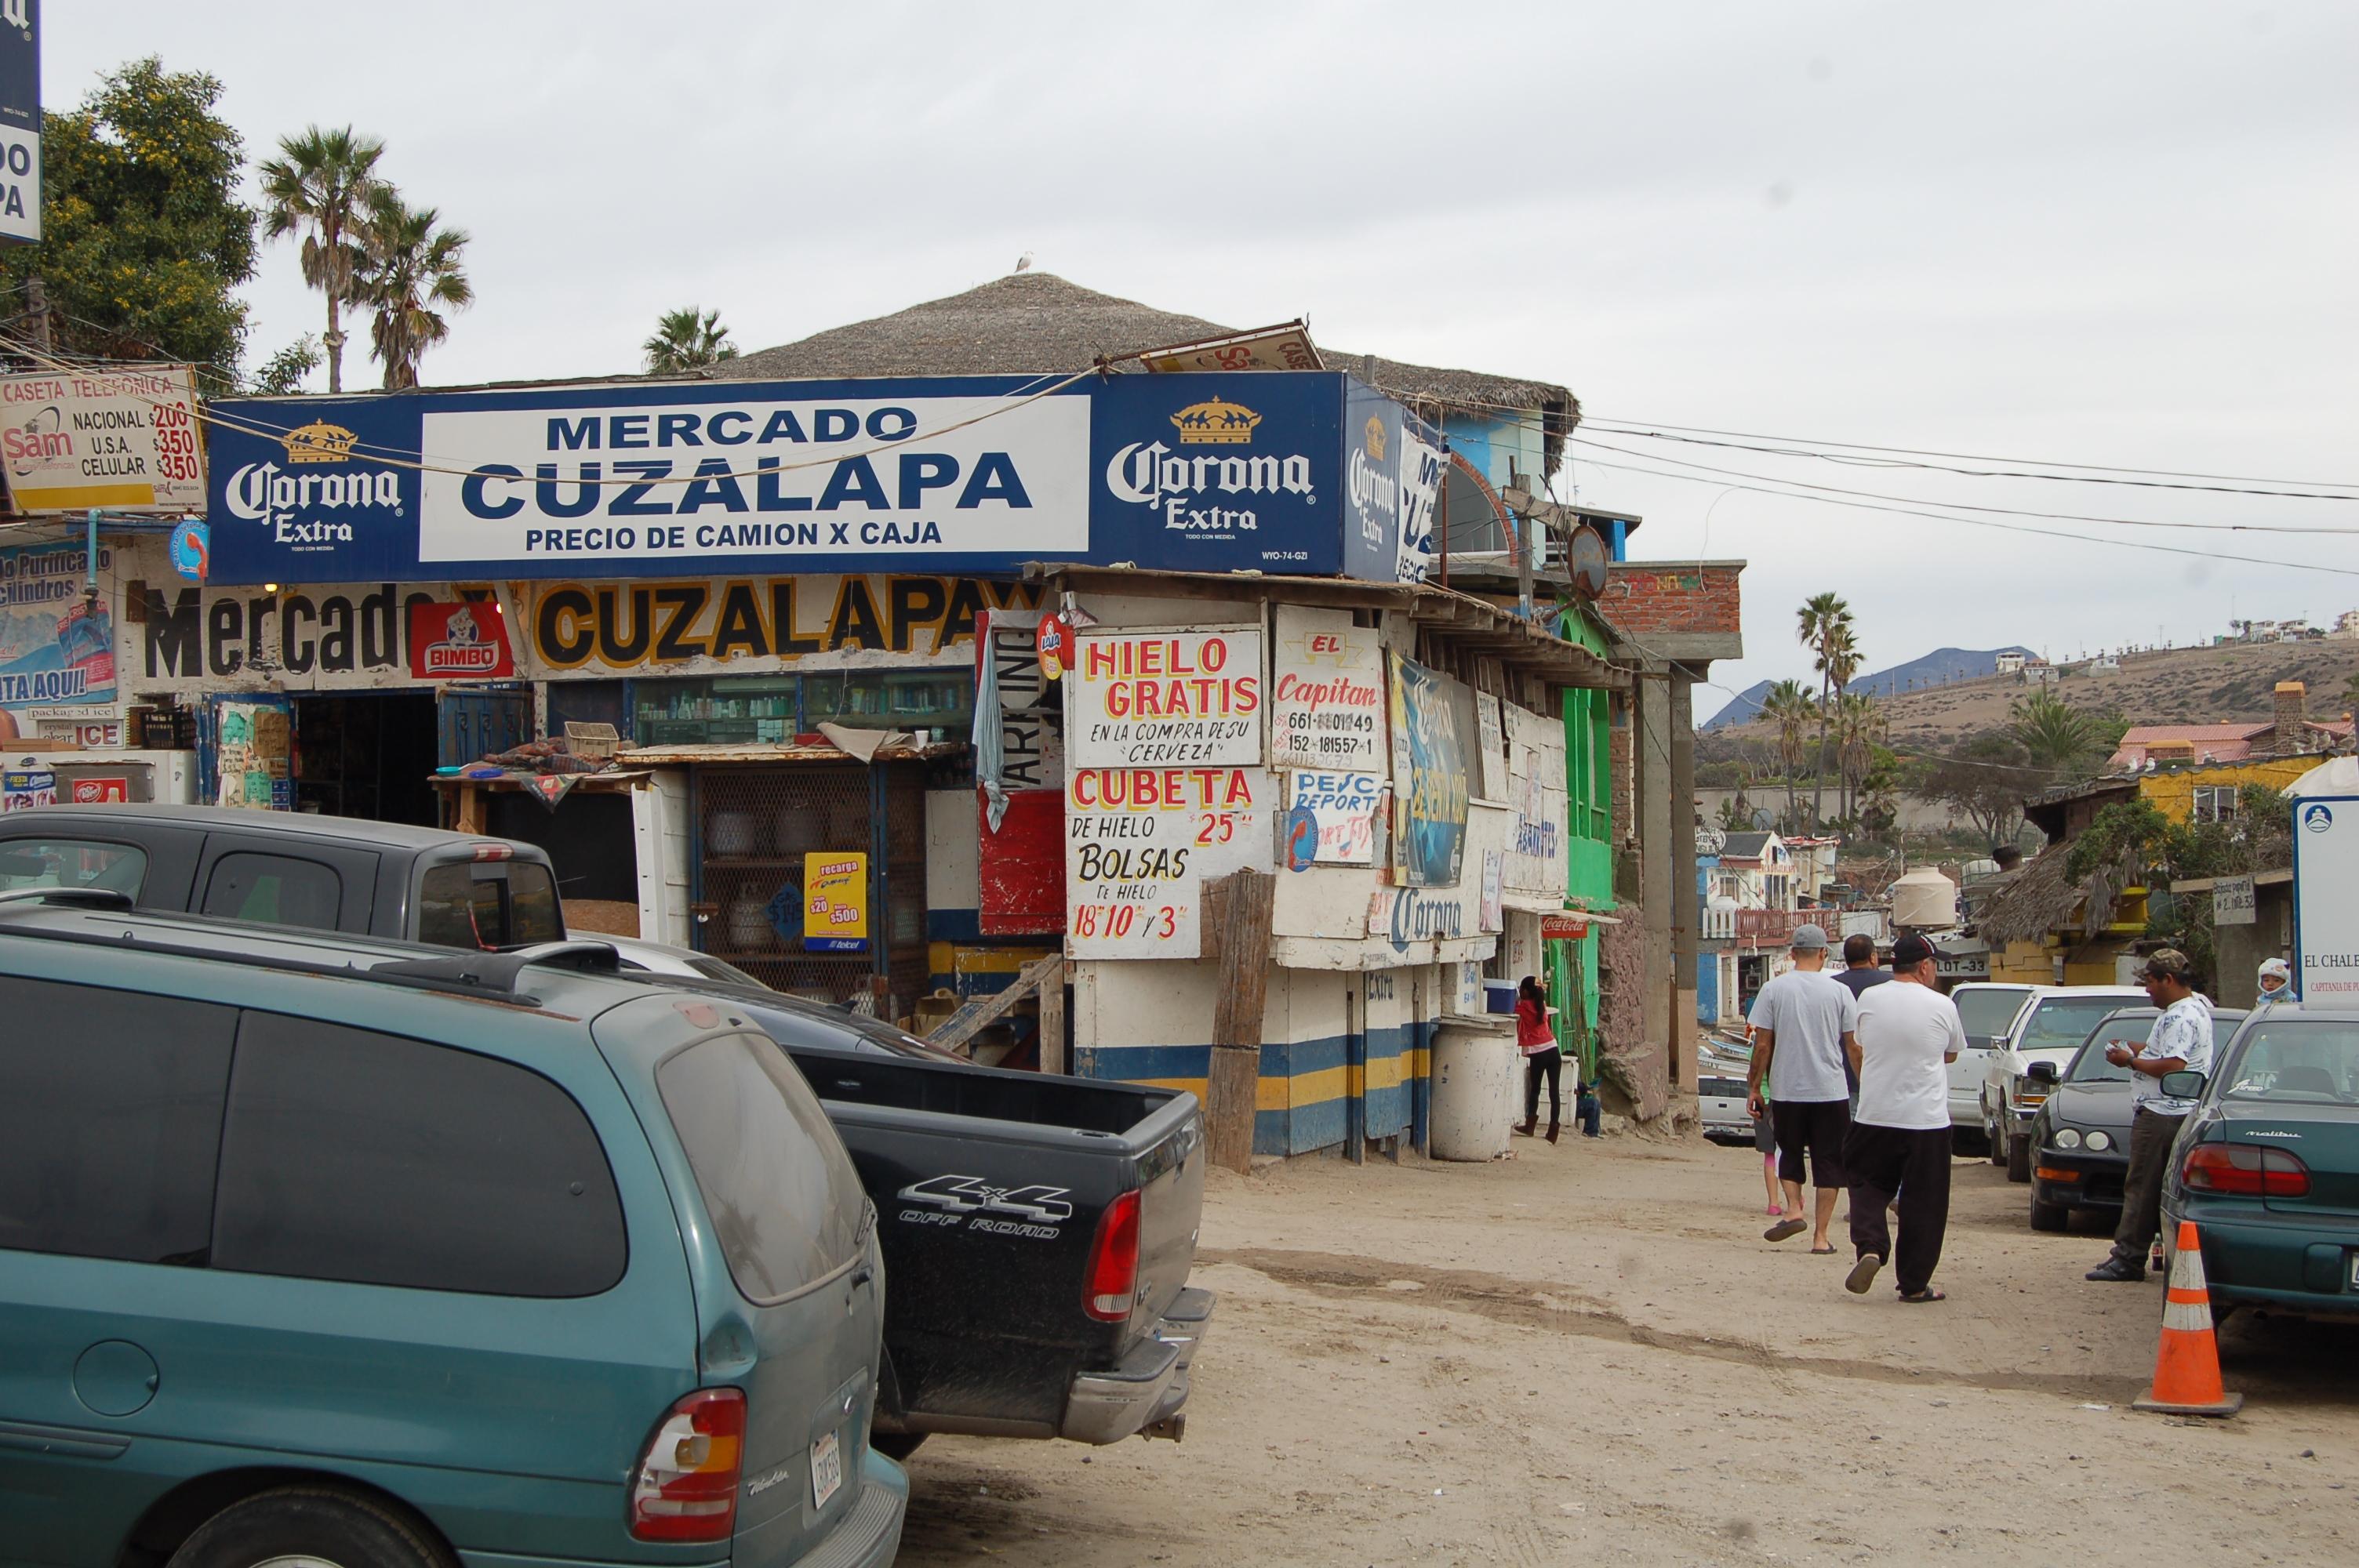 Popotla Feeding My Mariscos Madness Again A Gringo In Mexico